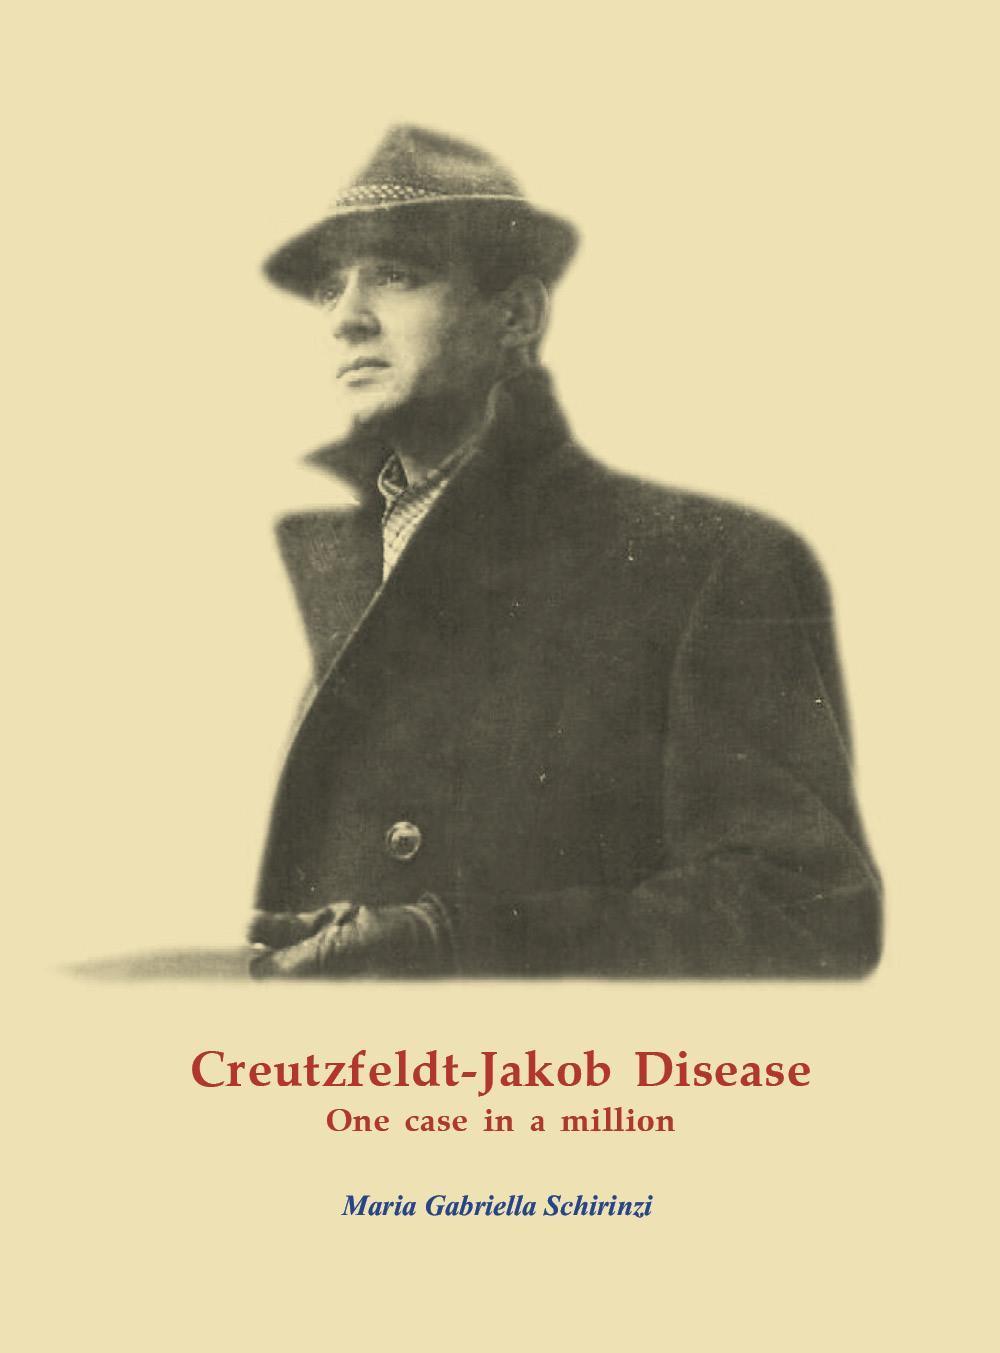 Creutzfeldt-Jakob Disease. One case in a million